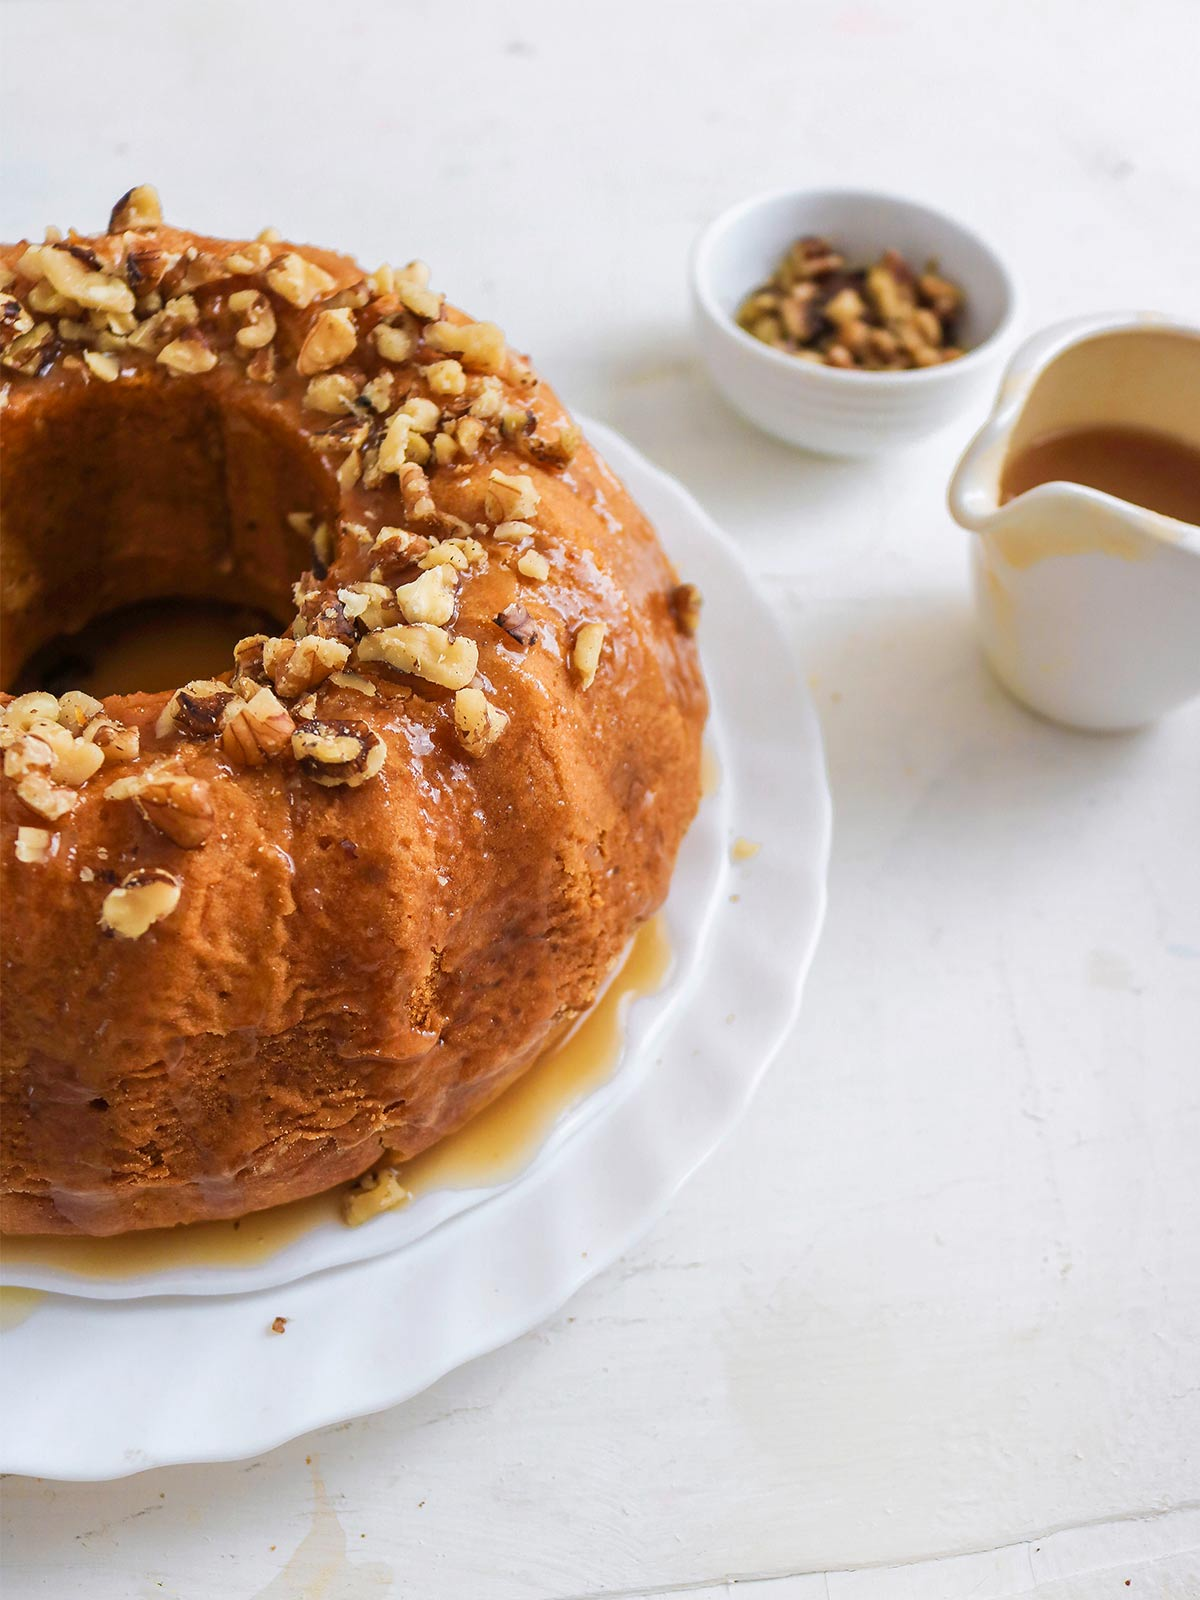 Vegan pumpkin bundt cake topped with caramel glaze and chopped walnuts